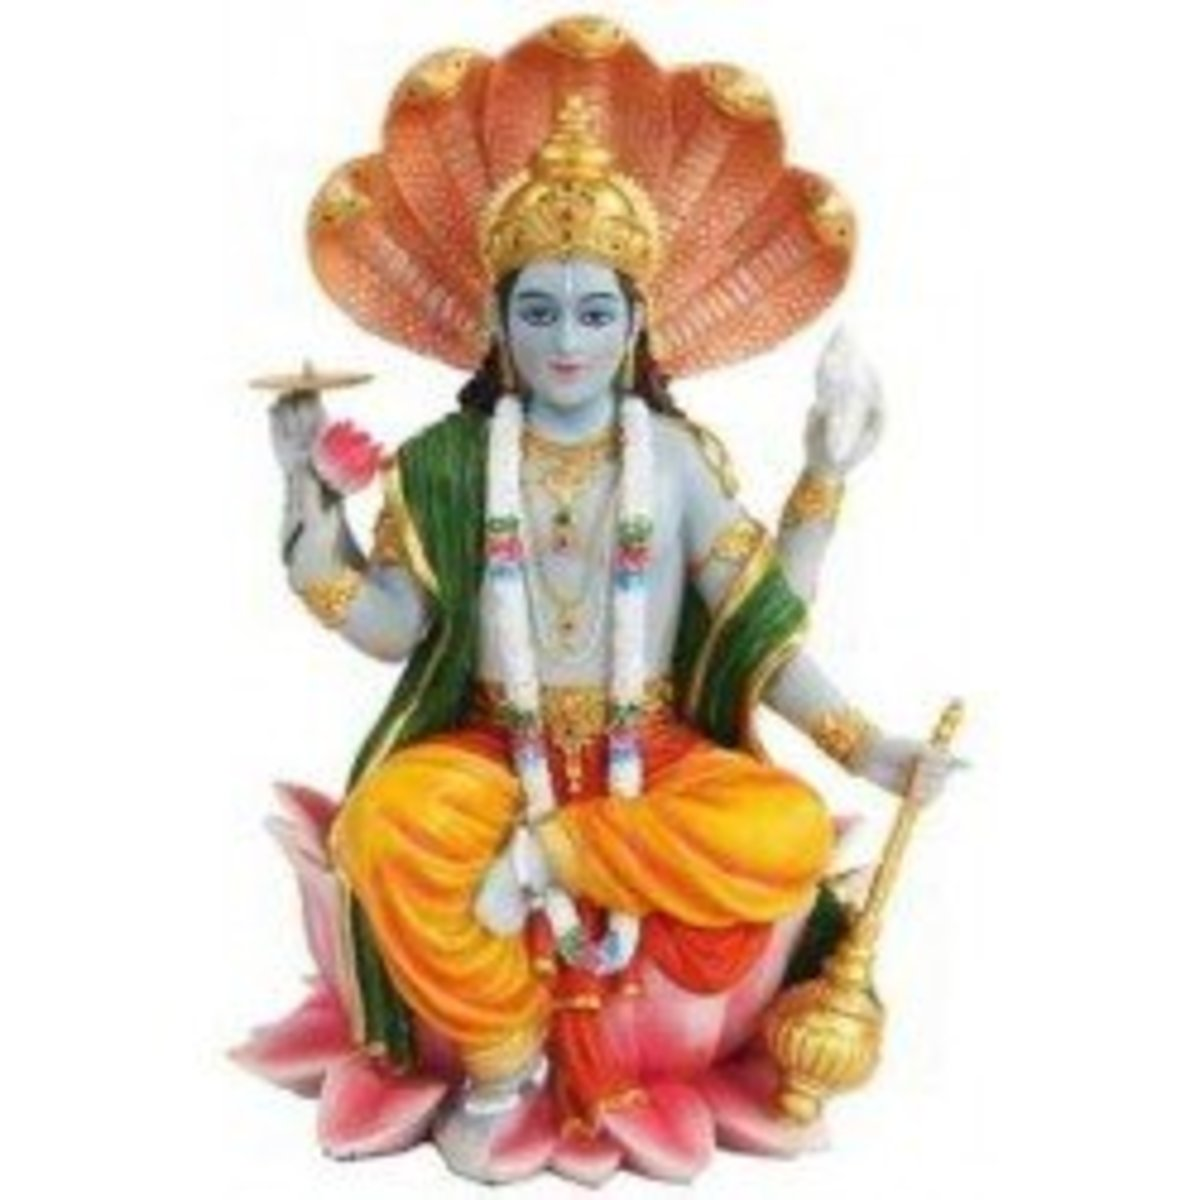 Vishnu doll